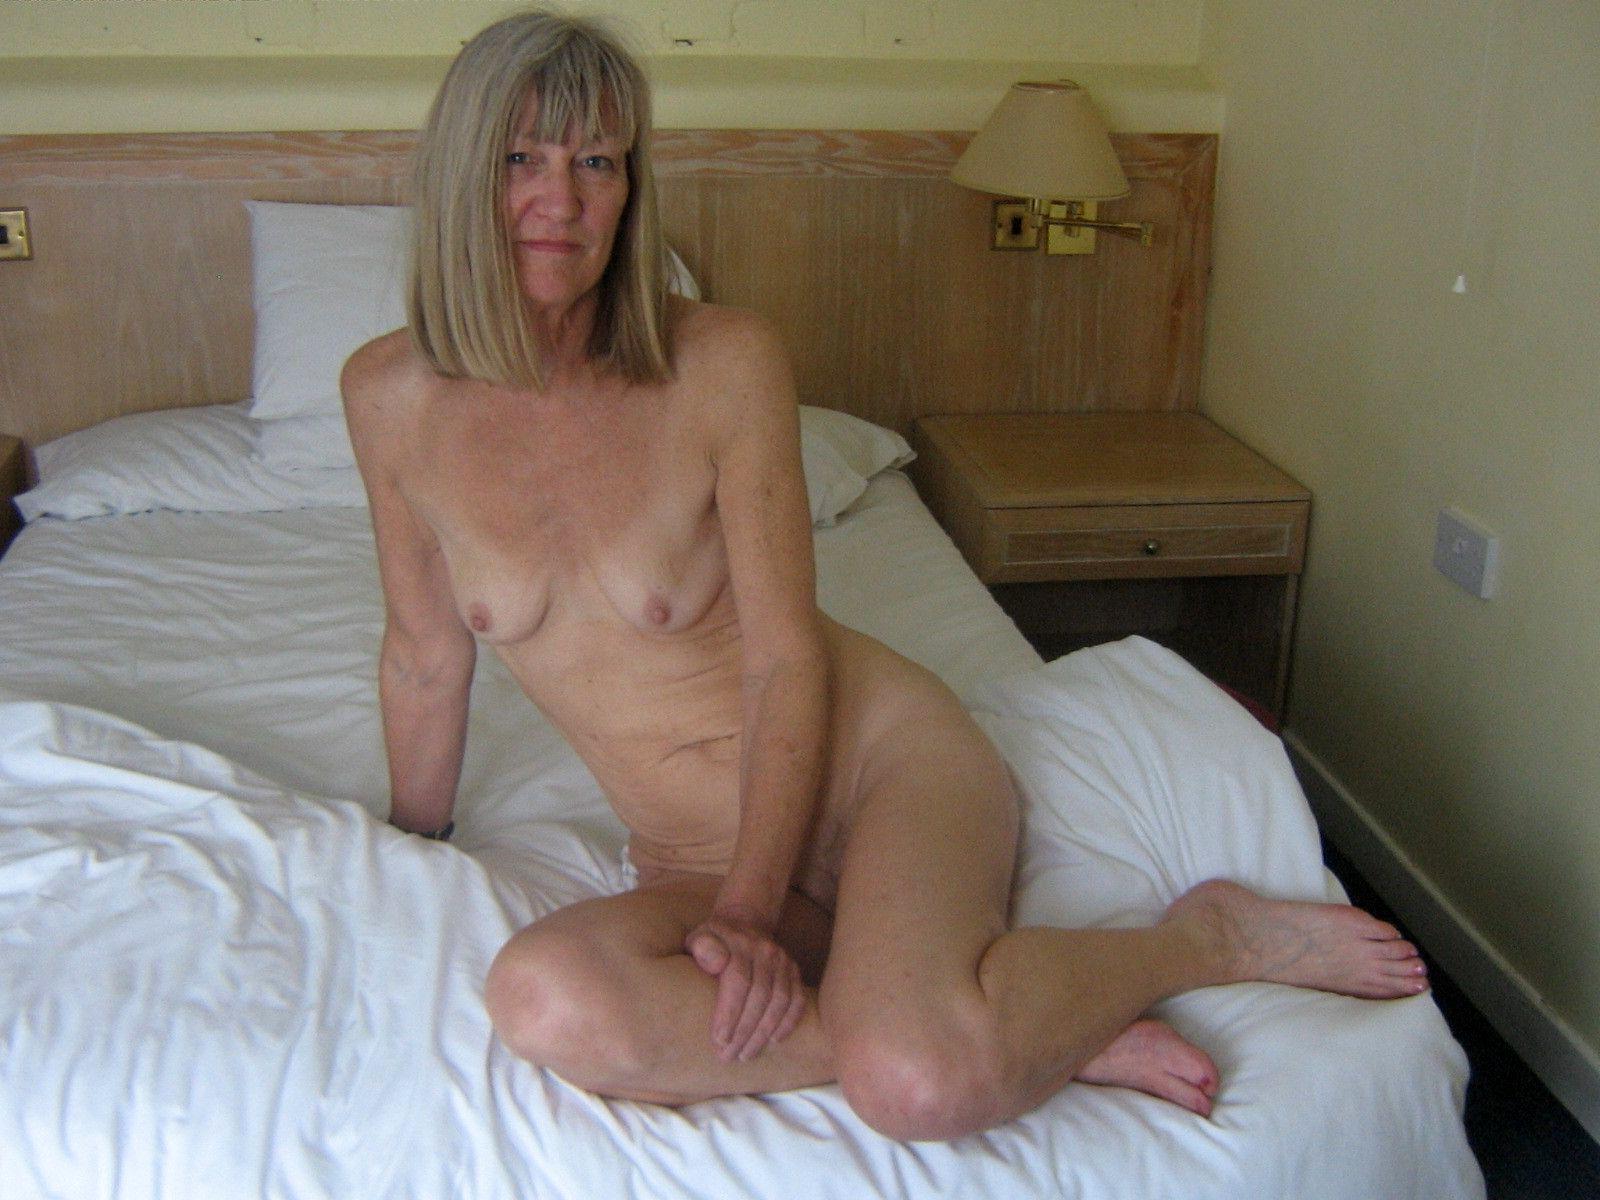 Shoulders down mature porn slender something is. Thanks